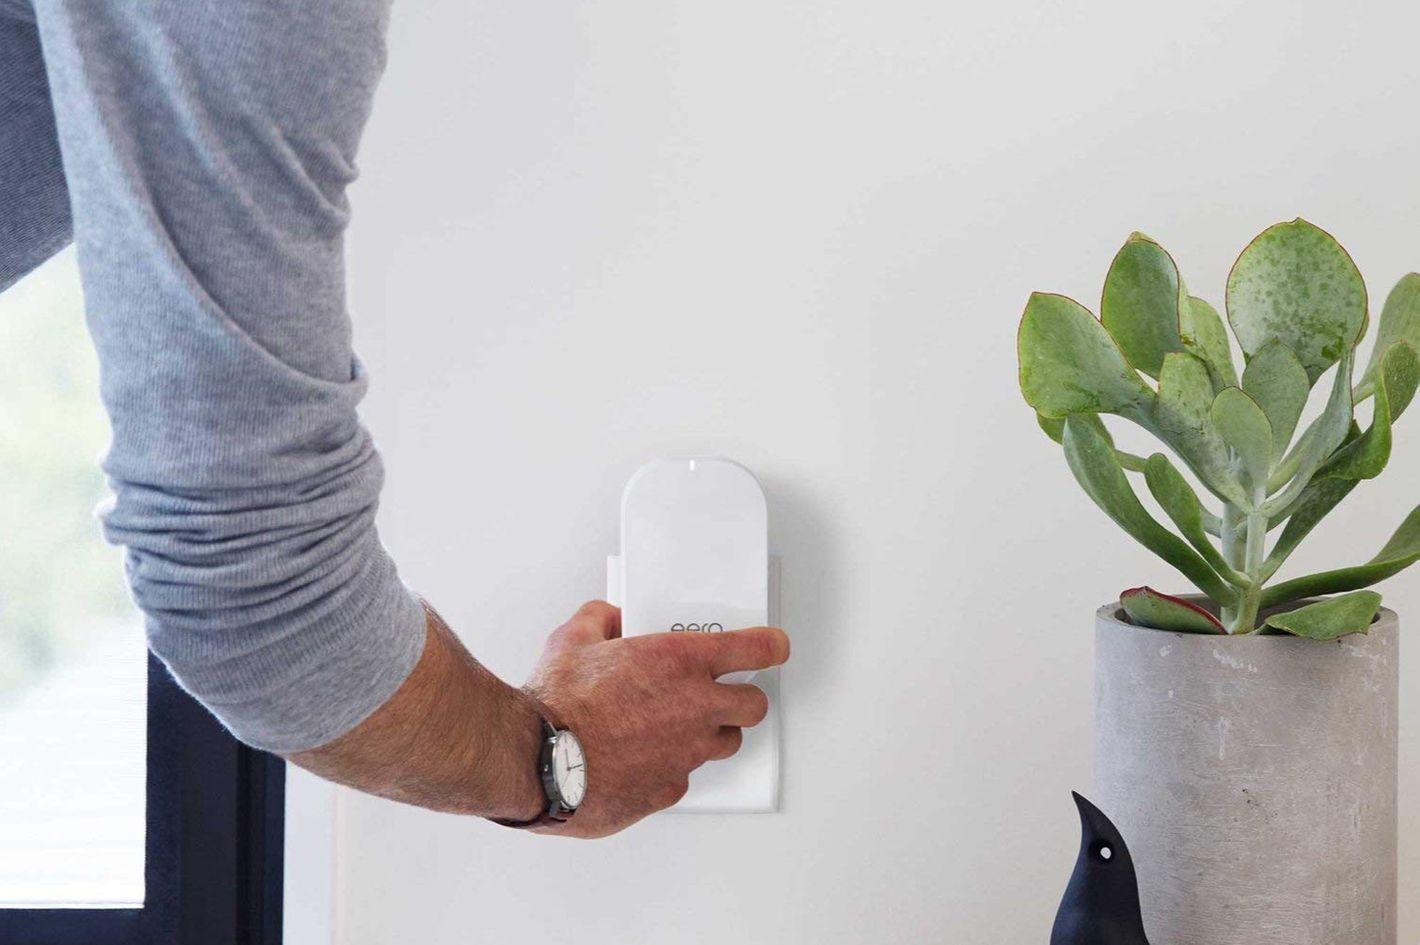 eero Home Wi-Fi System (1 eero + 1 eero Beacon)